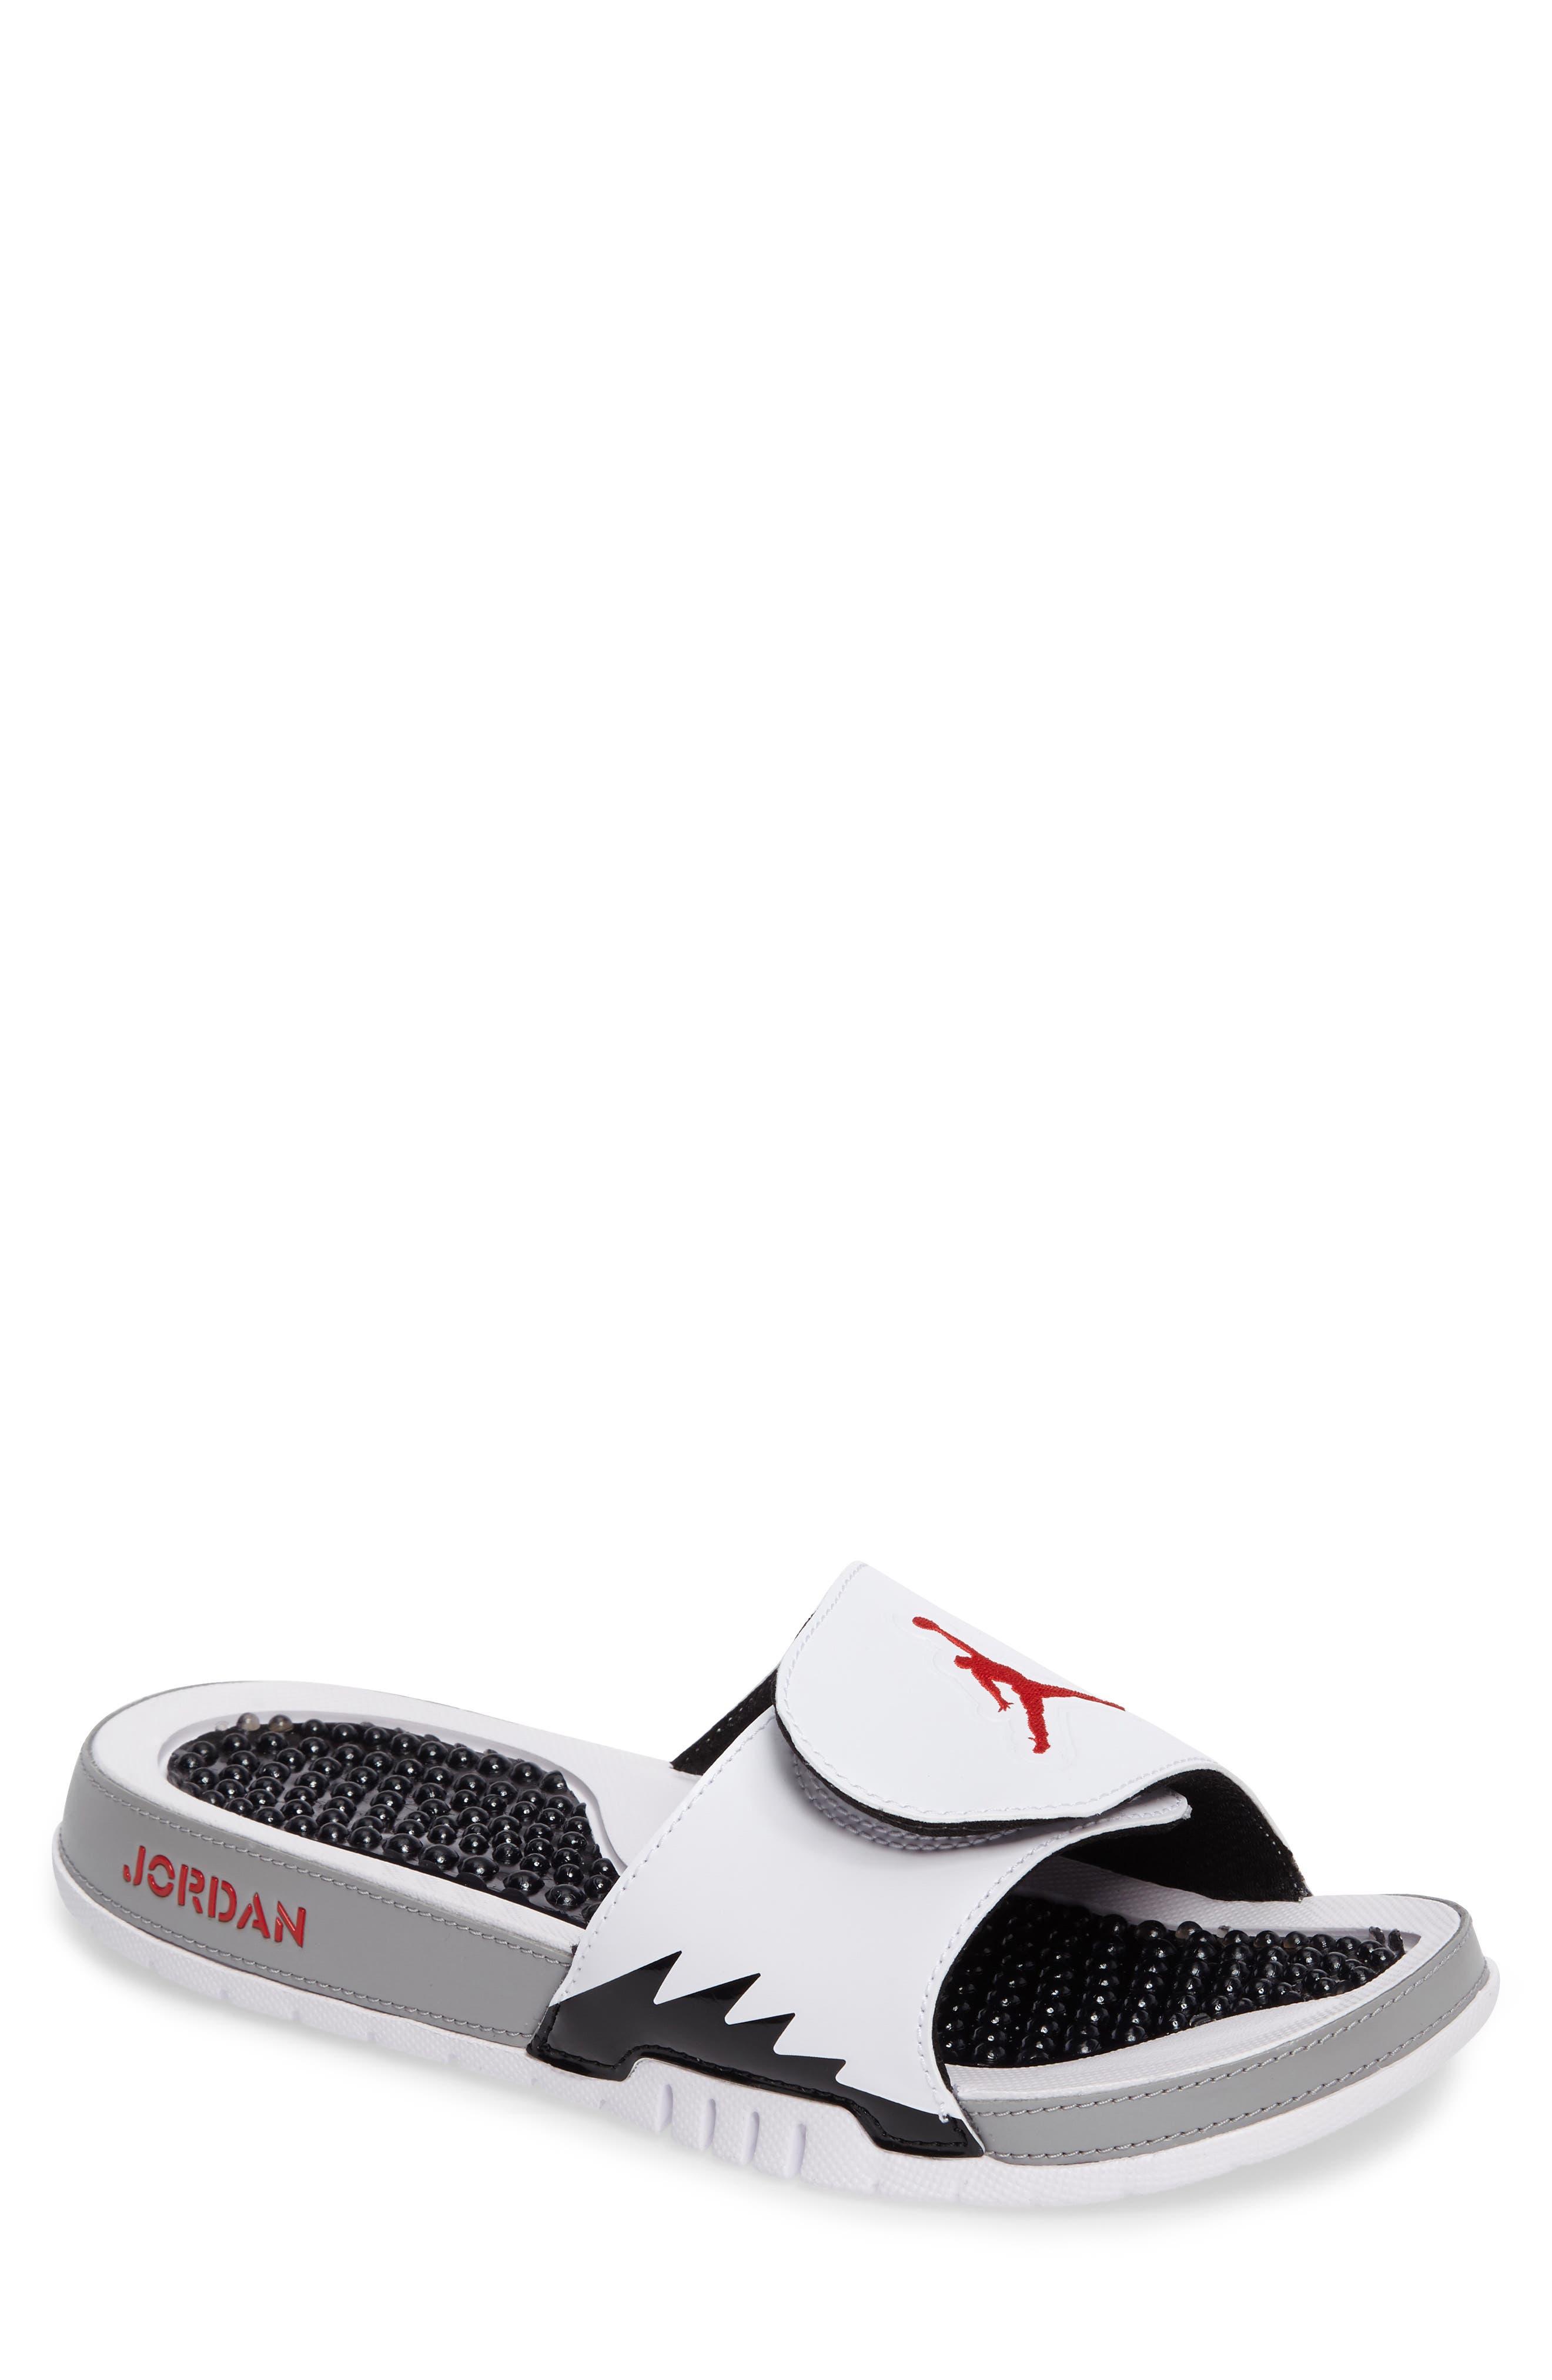 Main Image - Nike 'Jordan Hydro V Retro' Slide (Men)